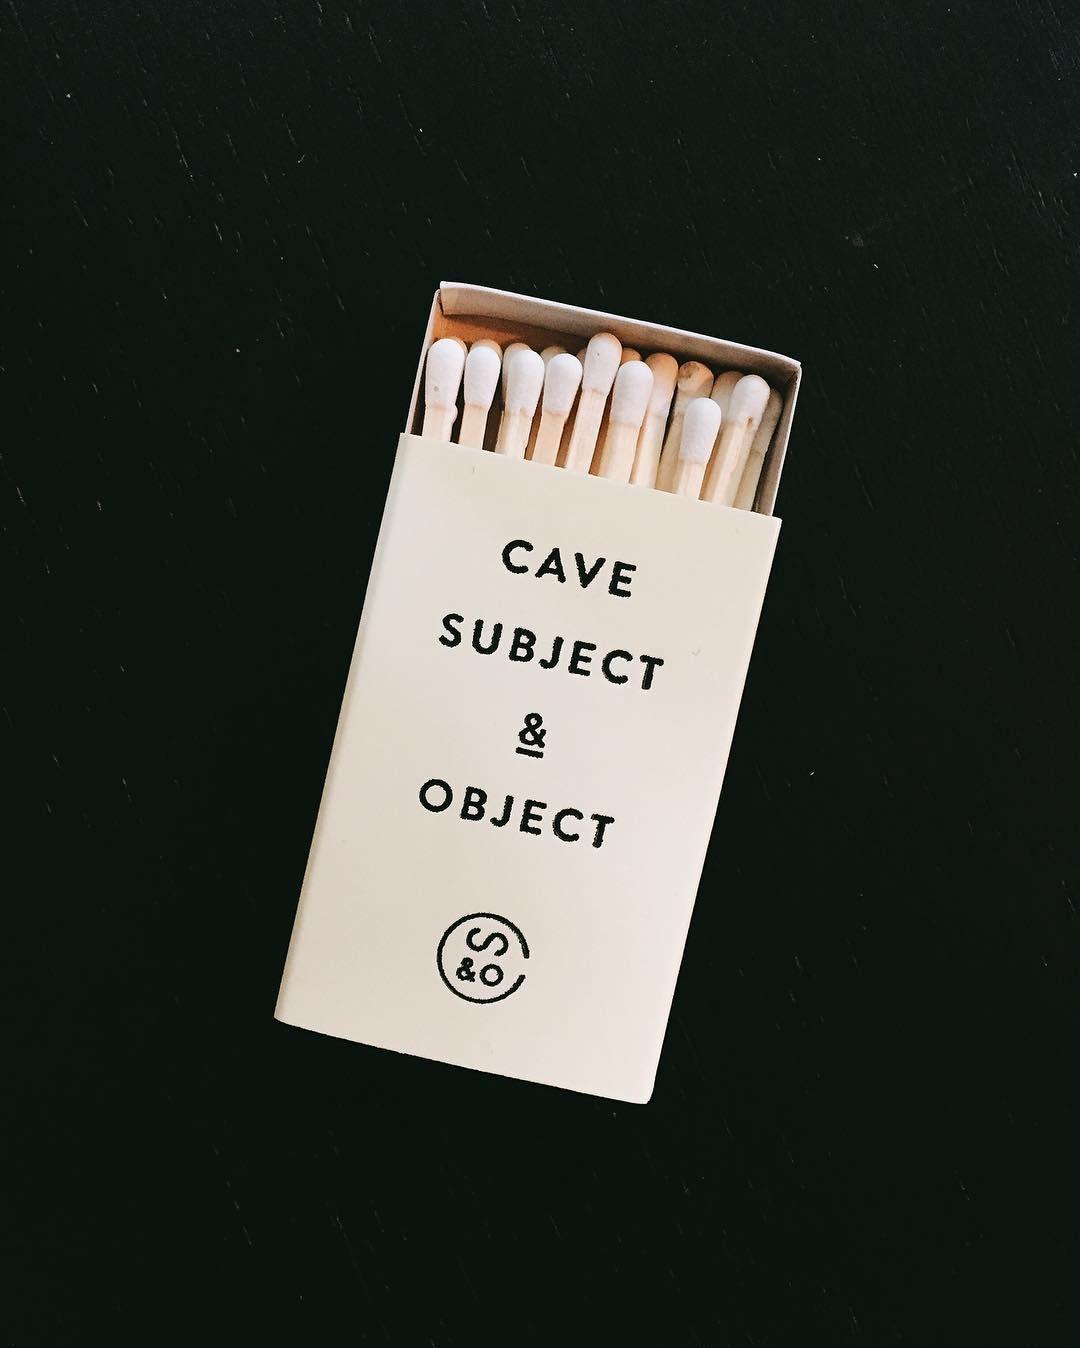 Packaging Inspiration: Packaging Design Inspiration